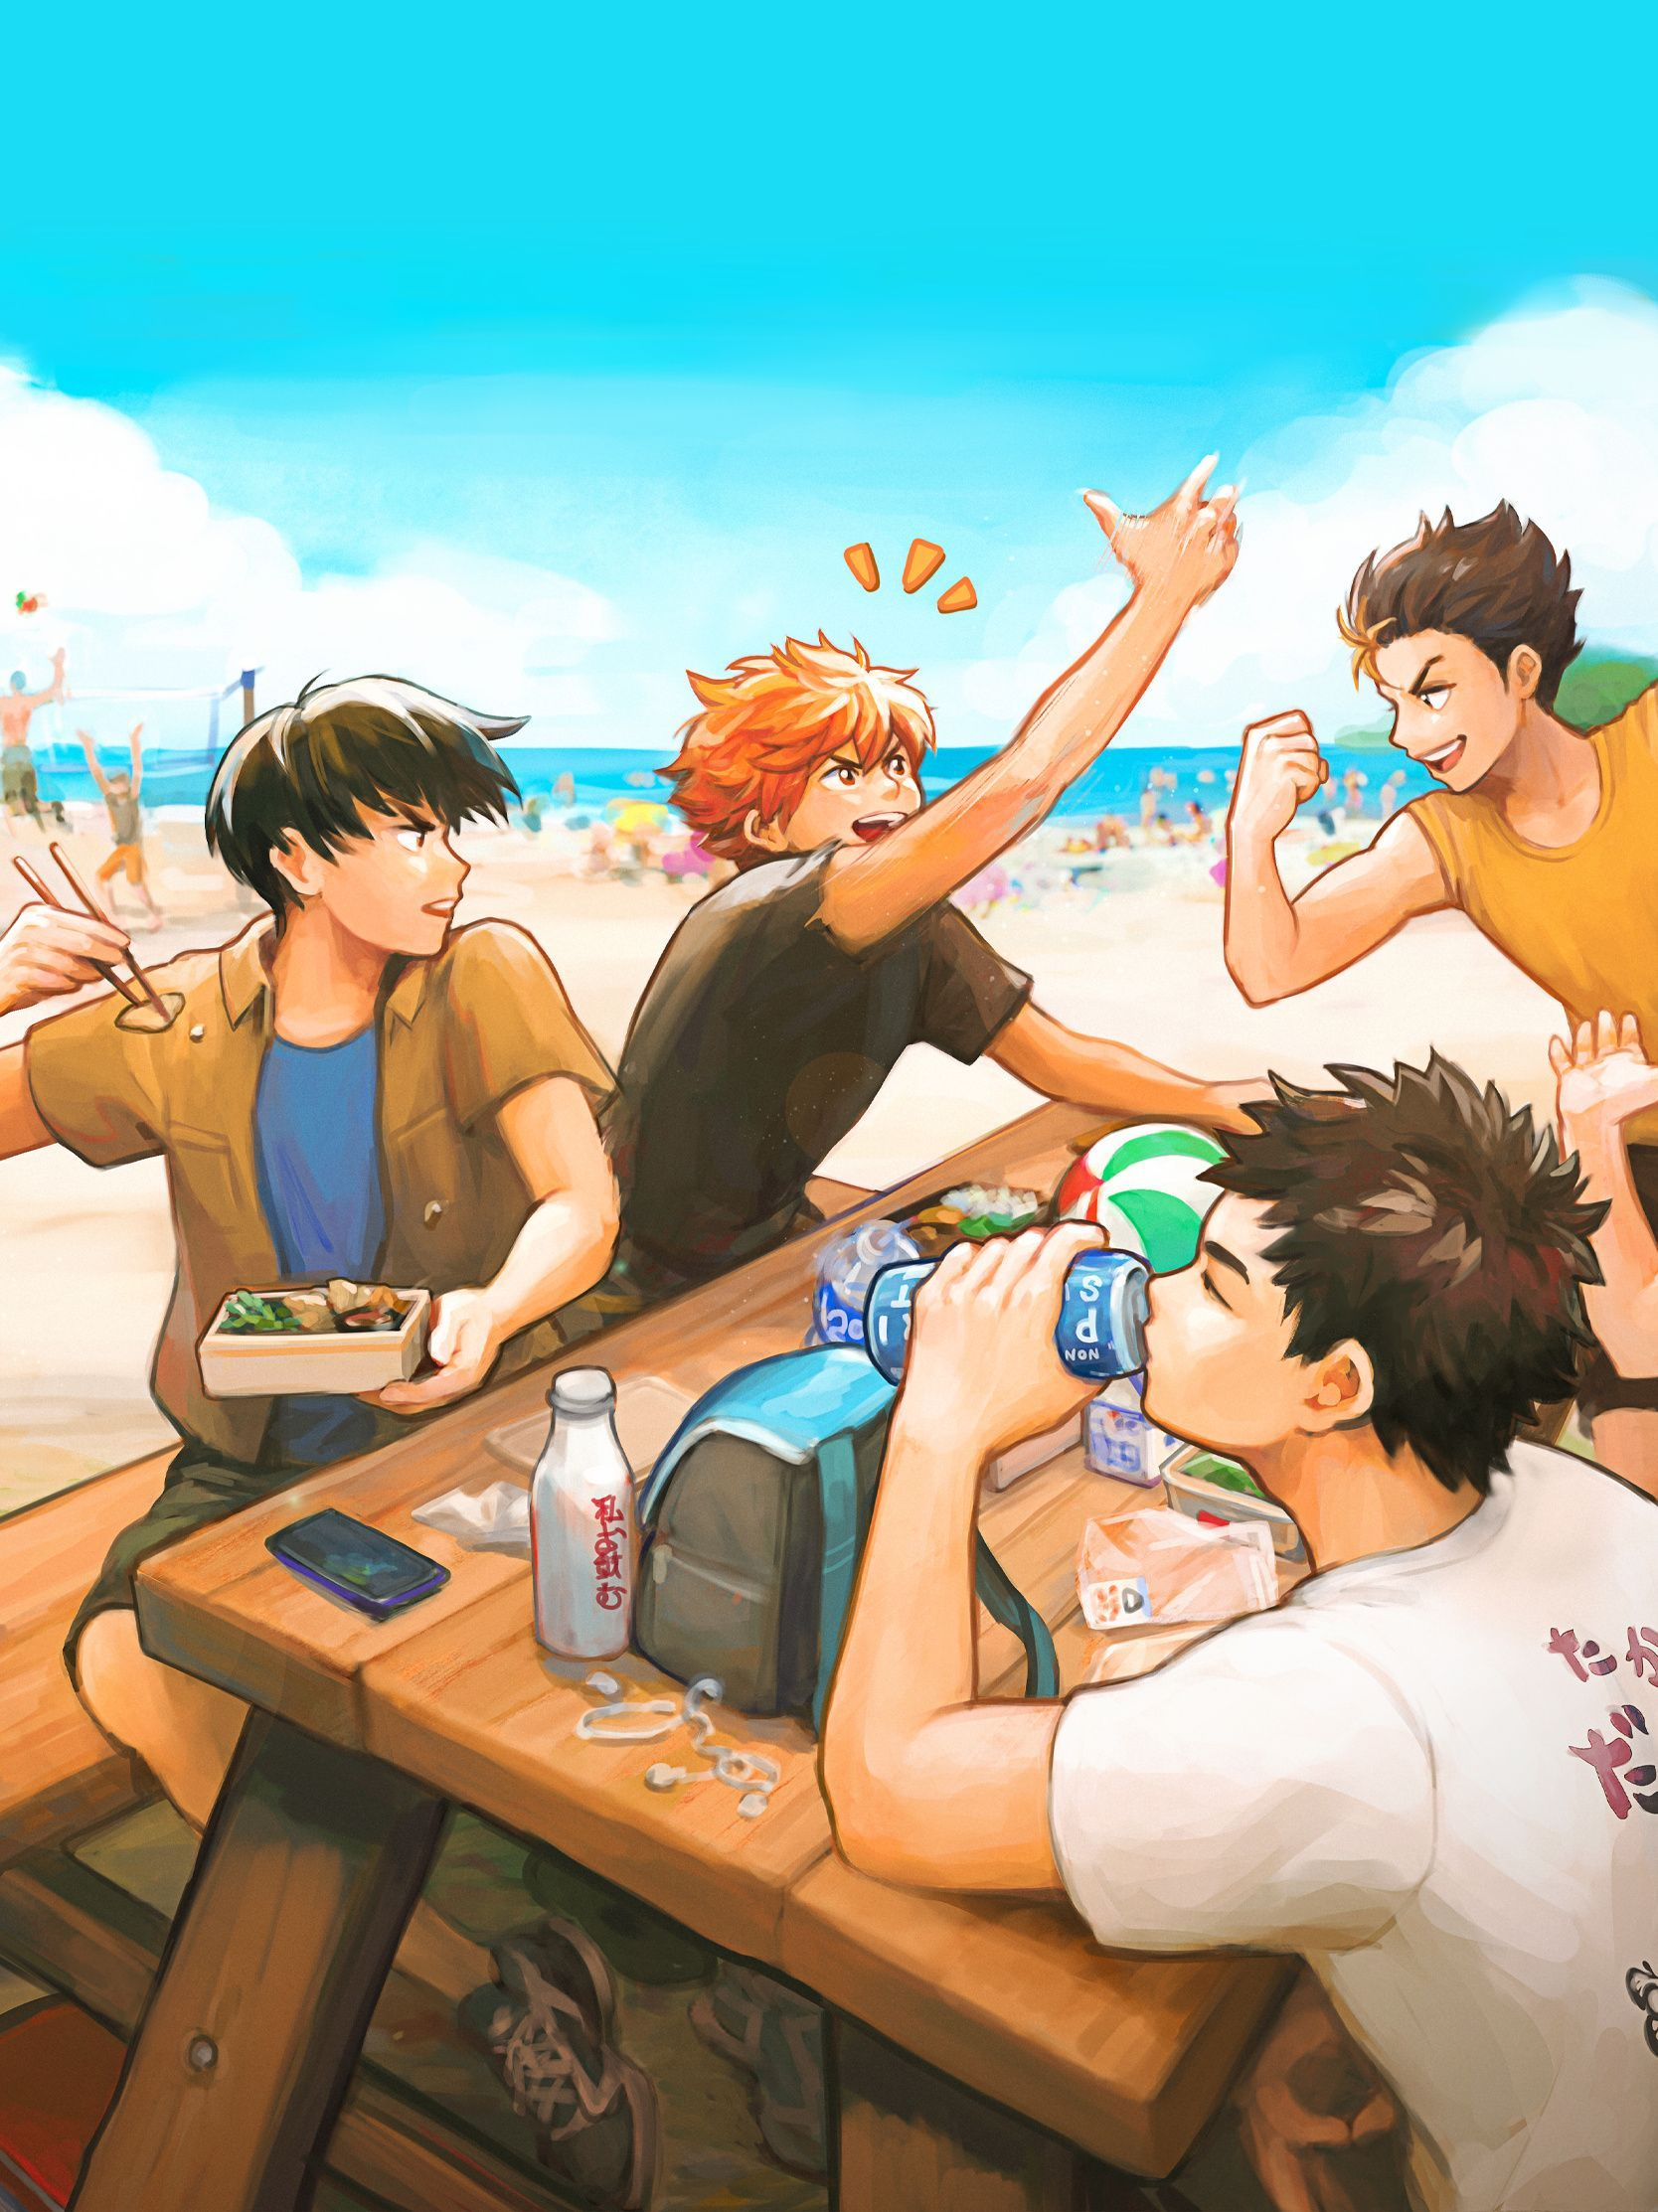 Haikyuu Beach Volleyball Cute Fan Art Print In 2020 Anime Haikyuu Fan Art